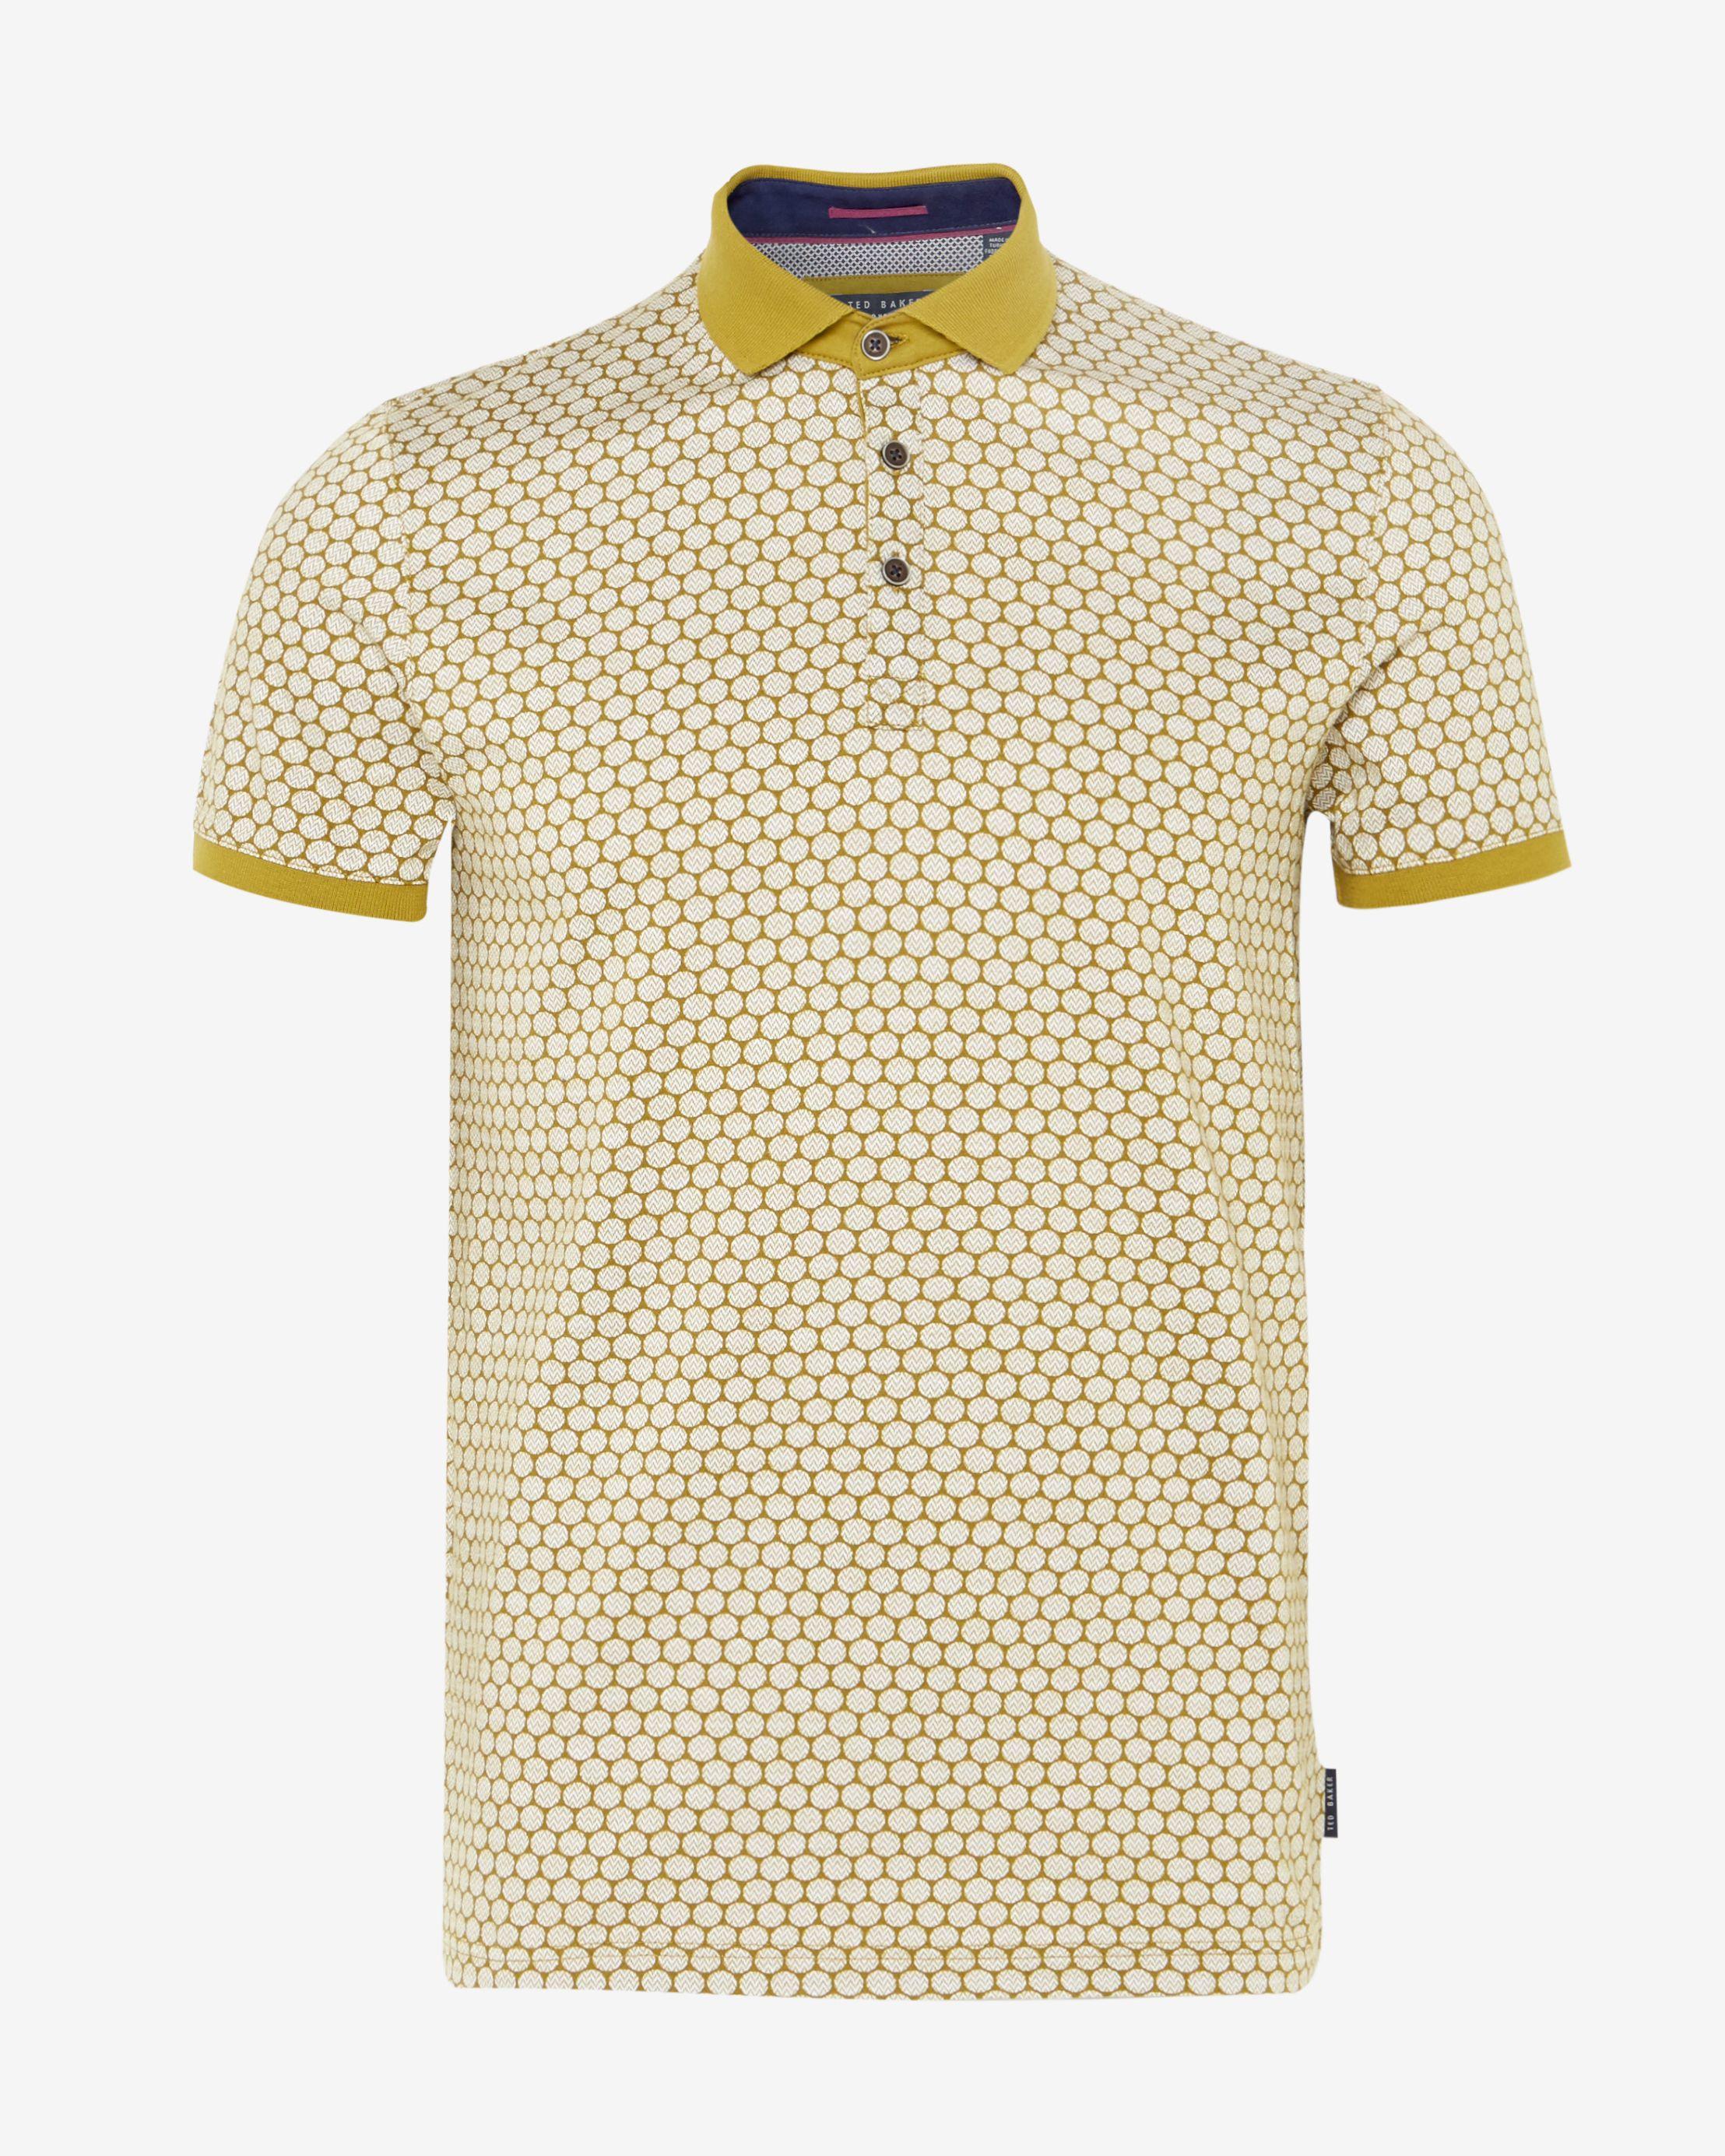 Ted baker runapp spot print polo shirt in green for men lyst for Ted baker mens polo shirts